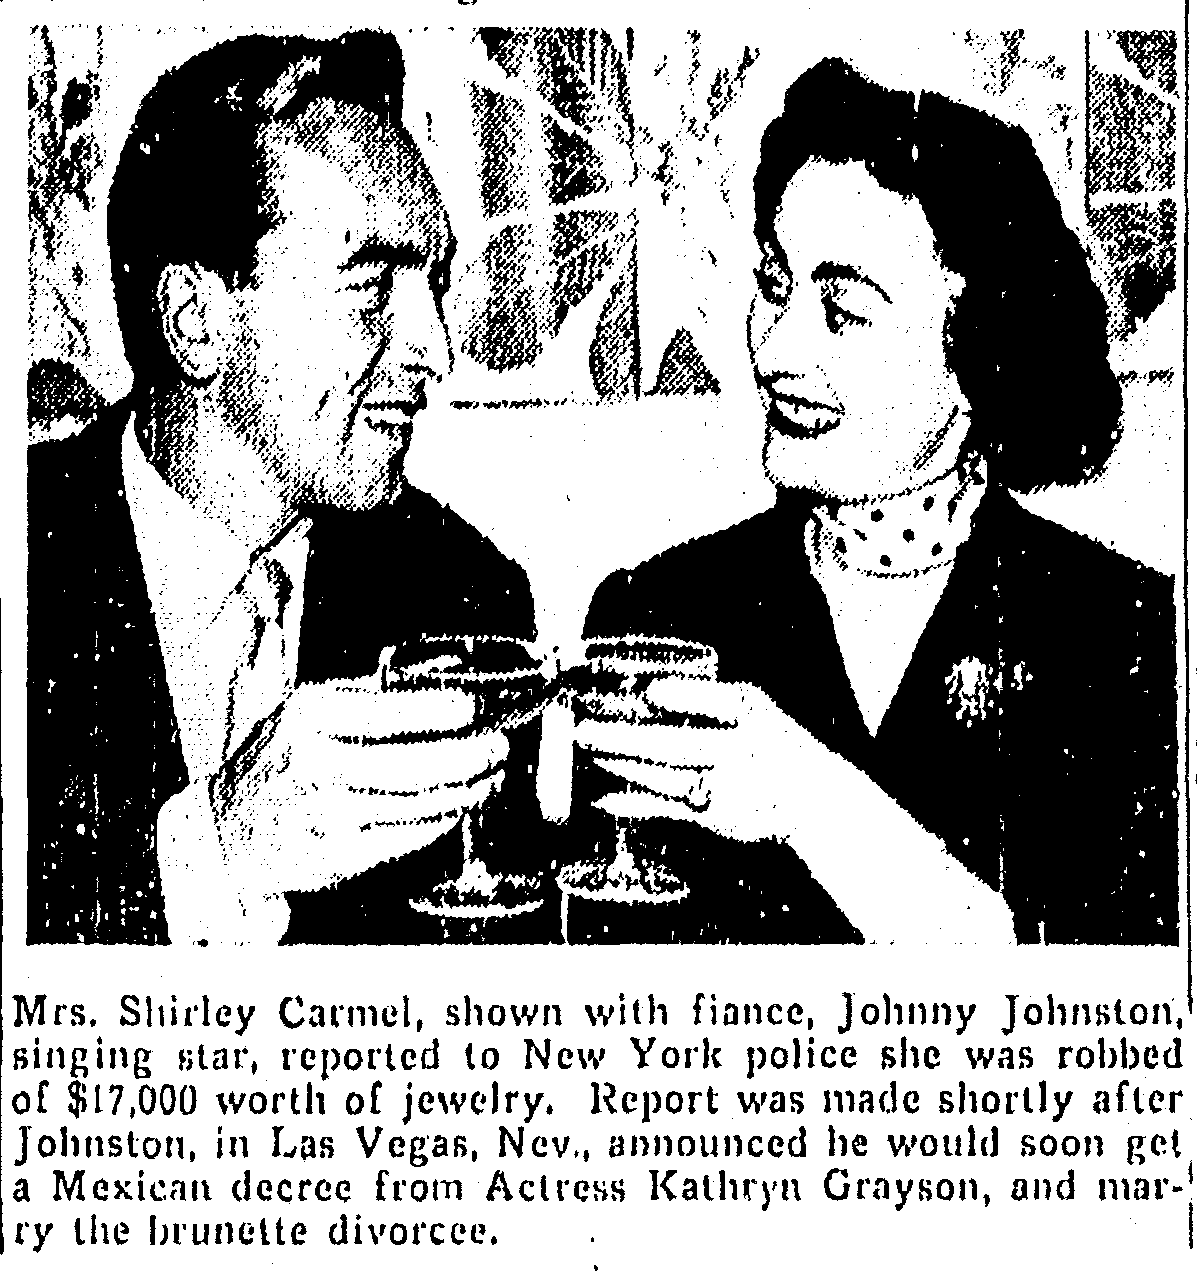 Boston_Daily_Record_1952-06-12_3